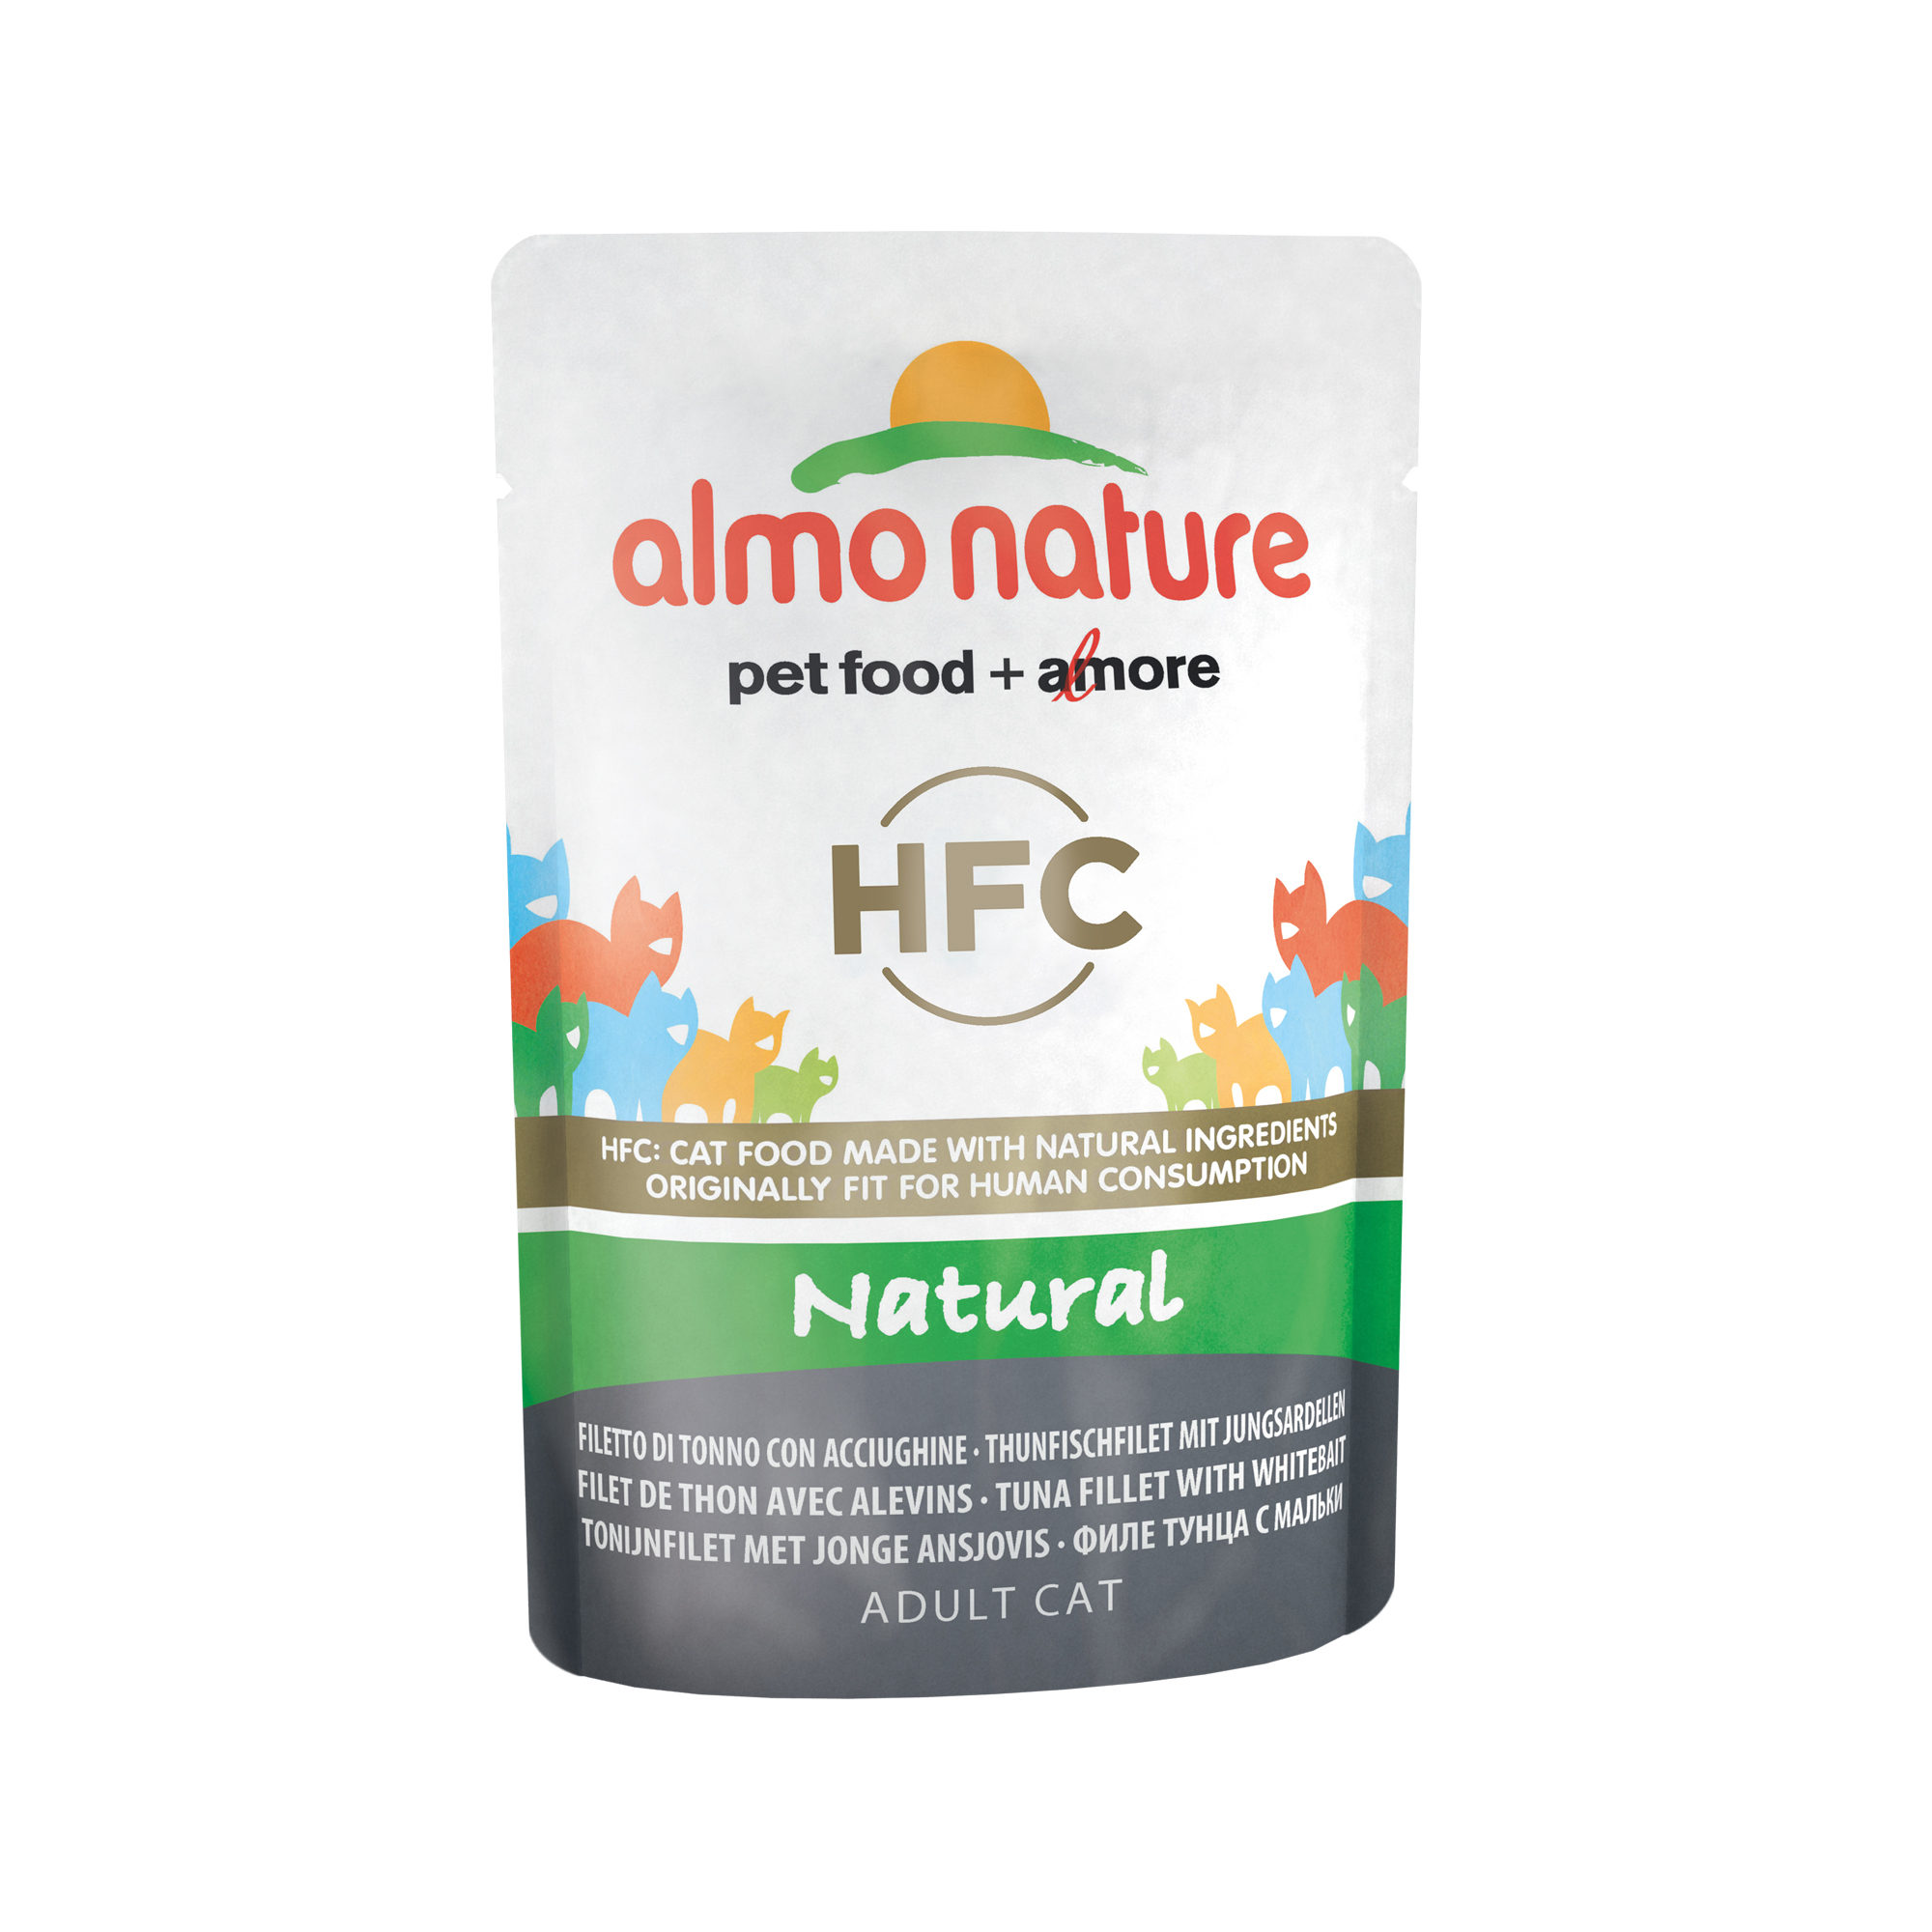 Almo Nature HFC Natural - Thon et blanchaille - Boîte - 24 x 55 g